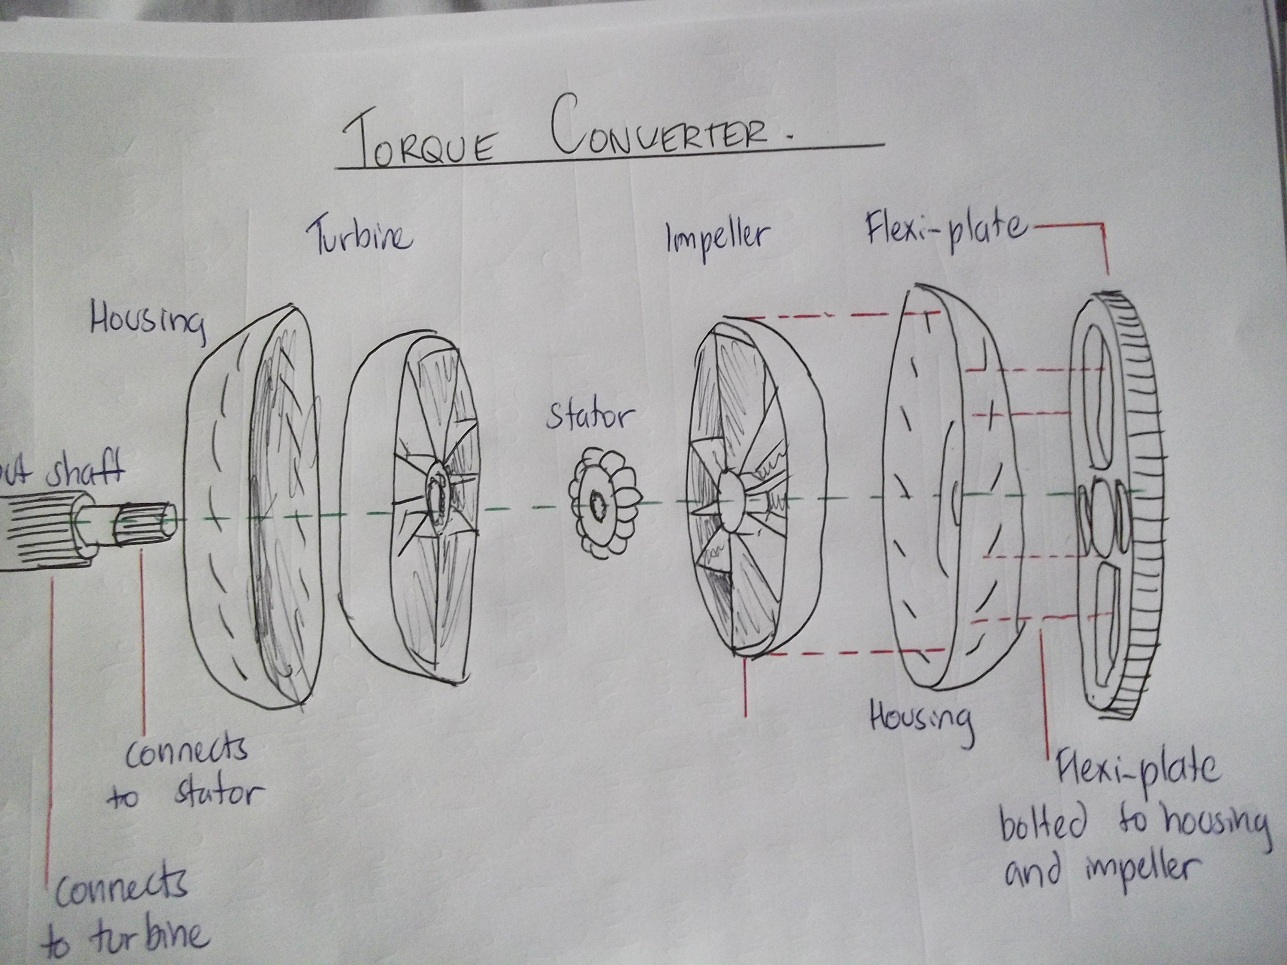 Curiosity Knowledge Power: Torque converters